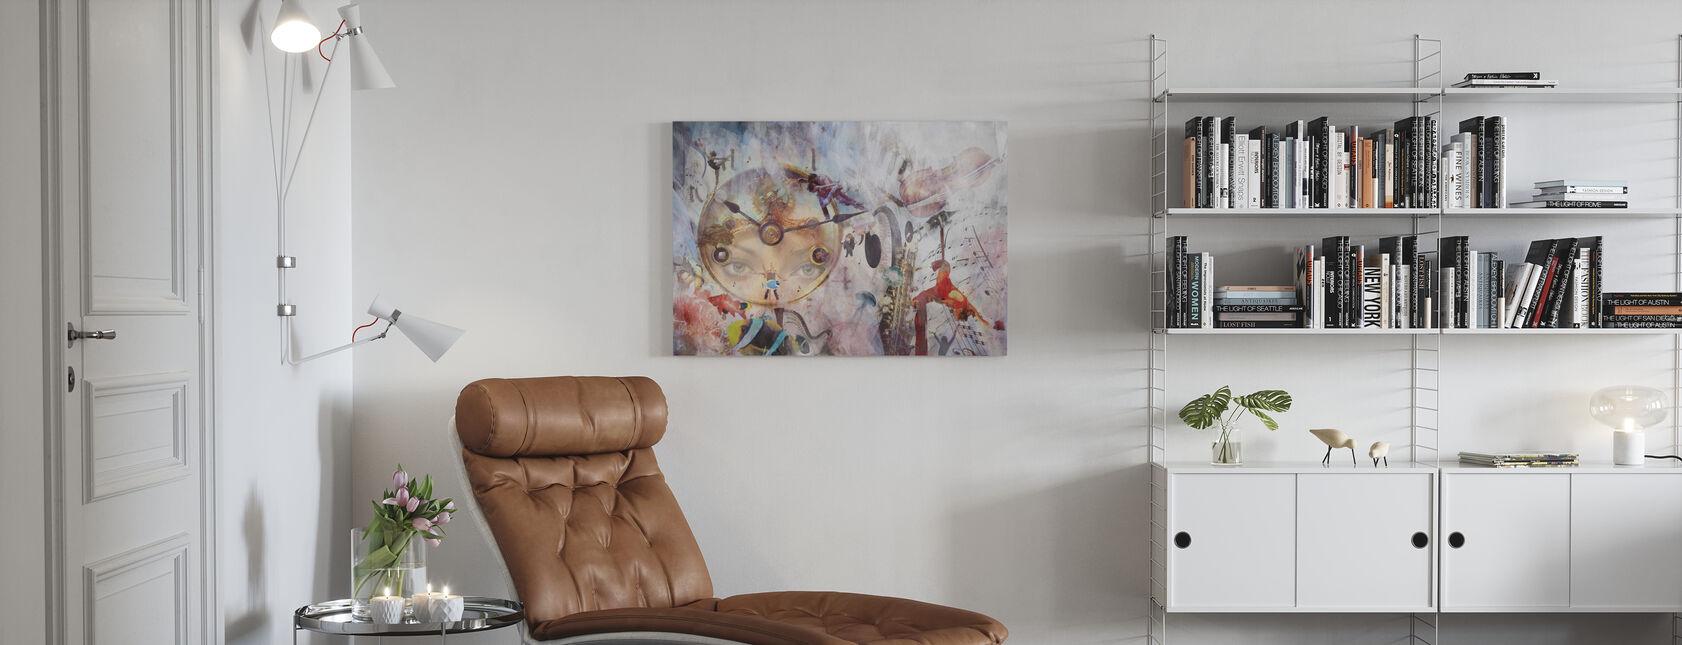 Tempo - Canvastavla - Vardagsrum